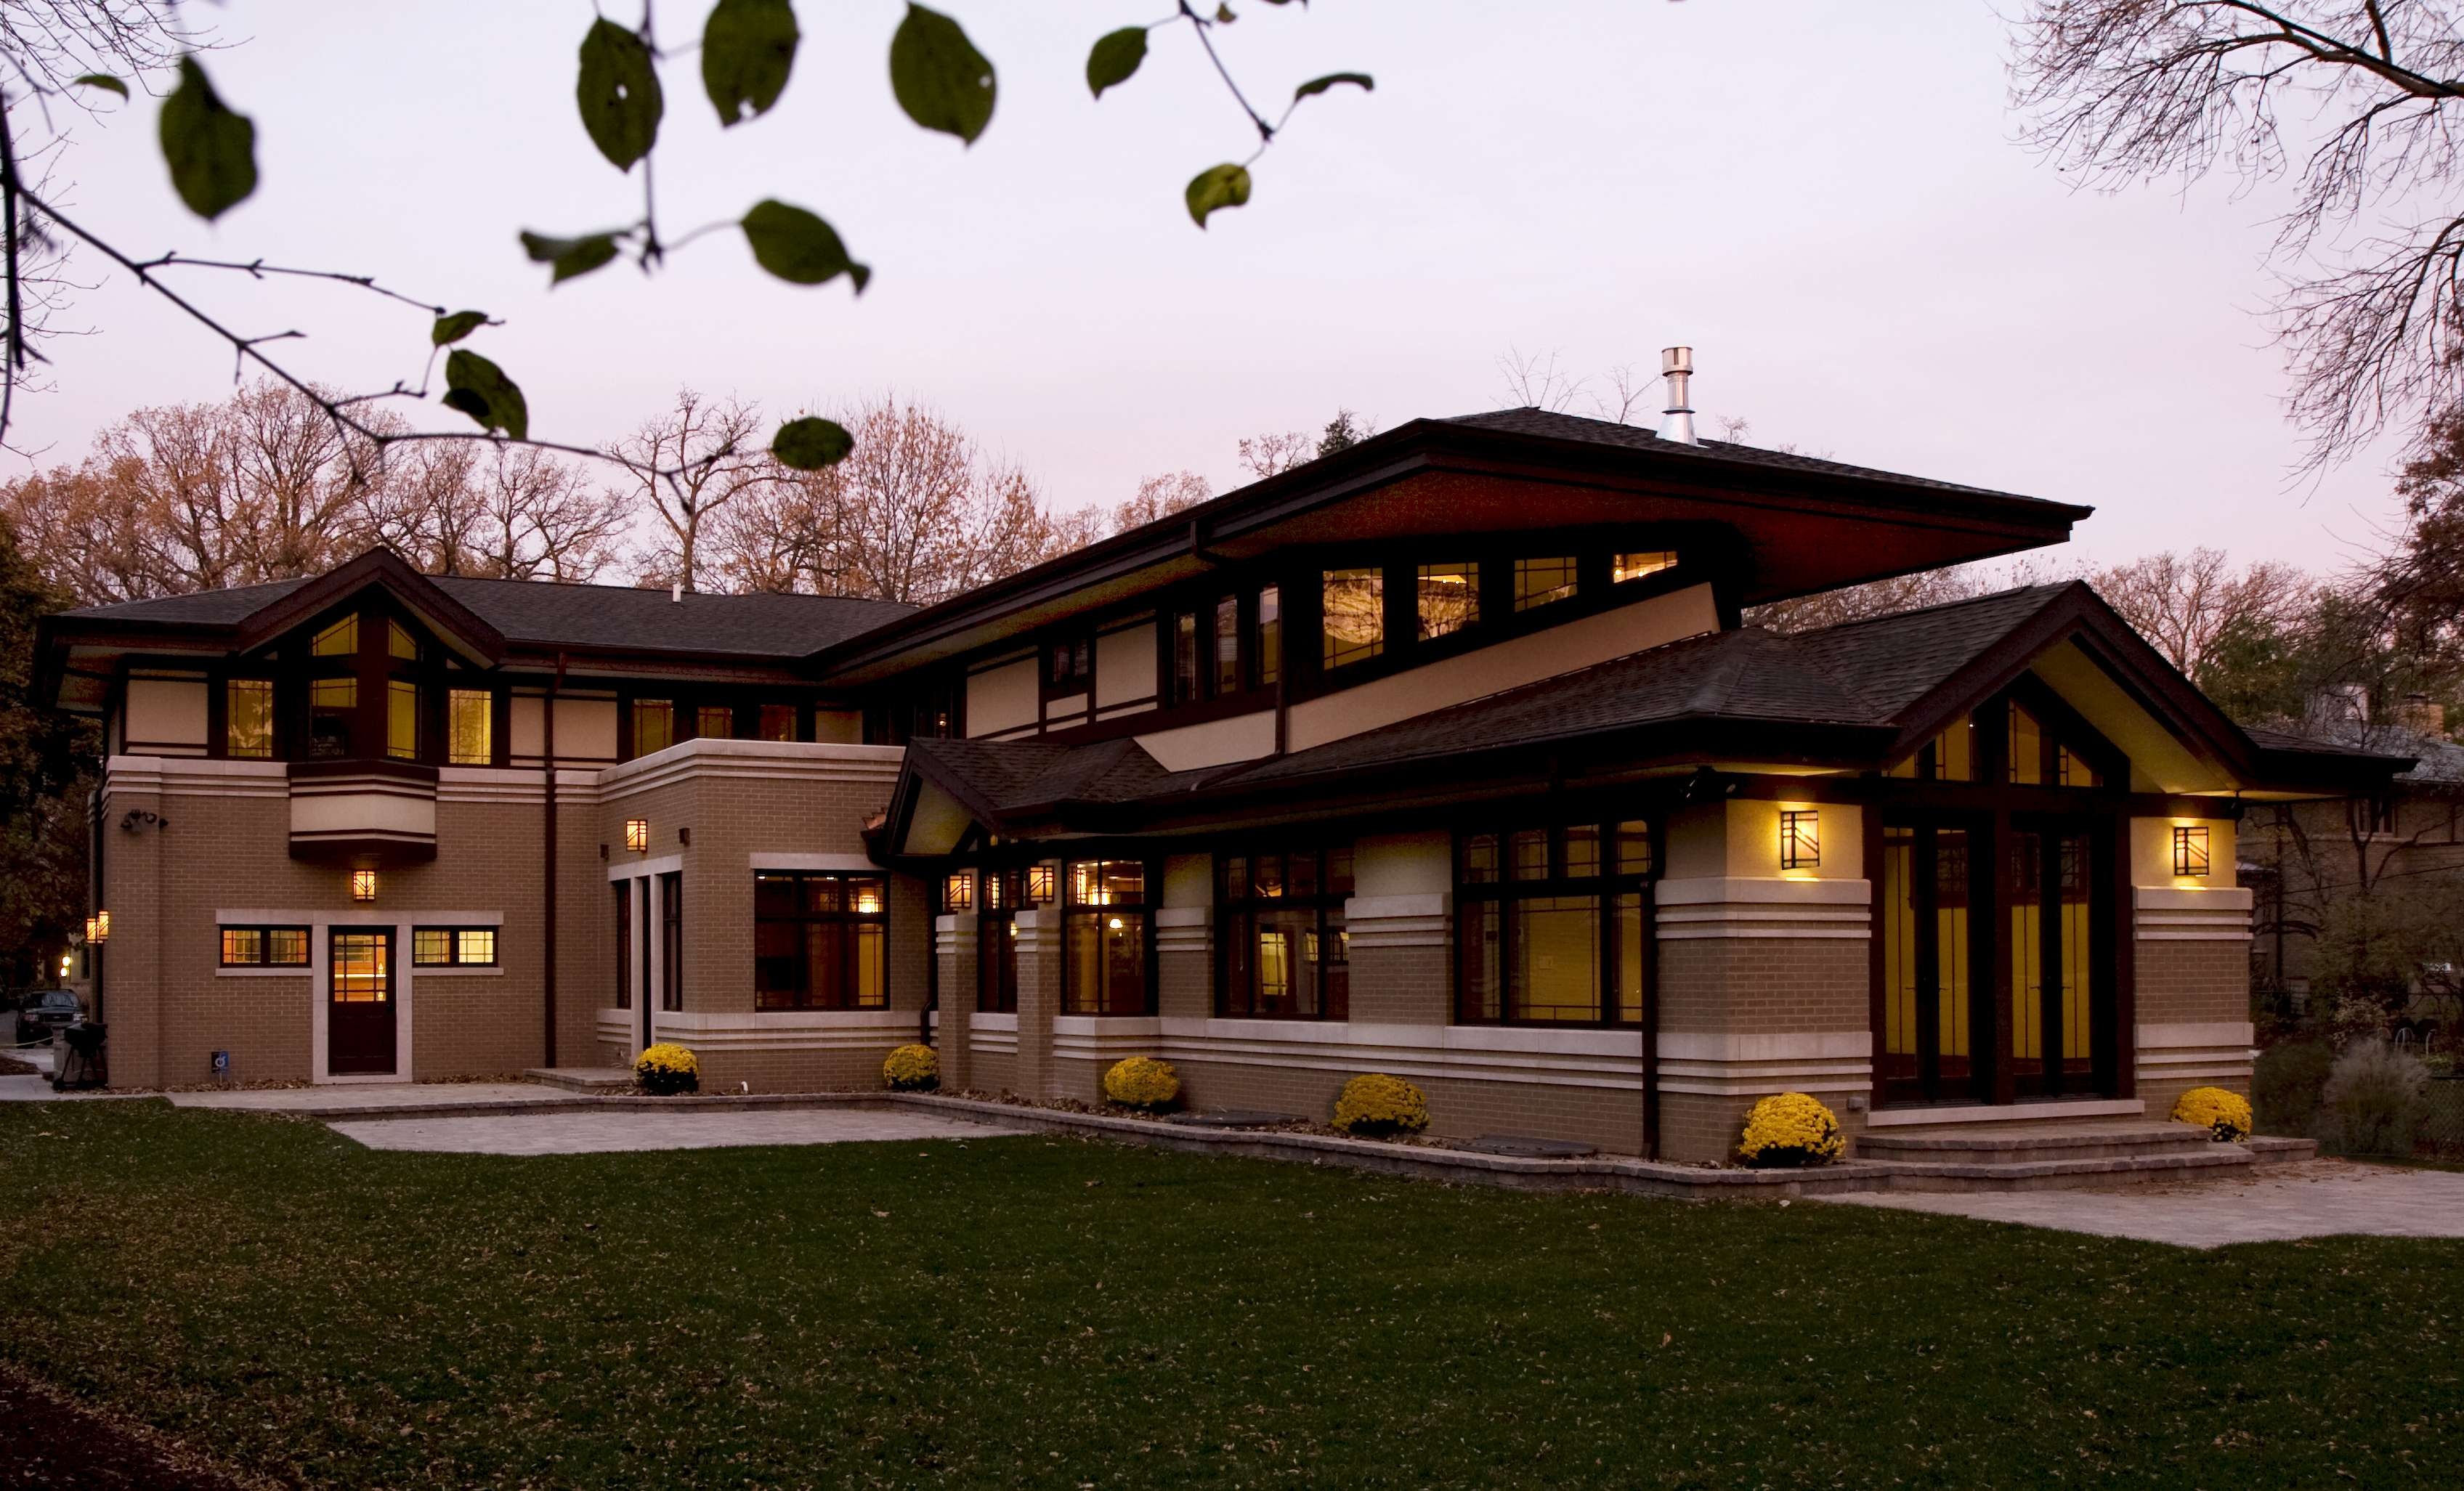 Architecture Frank Lloyd Wright Style Home Studio